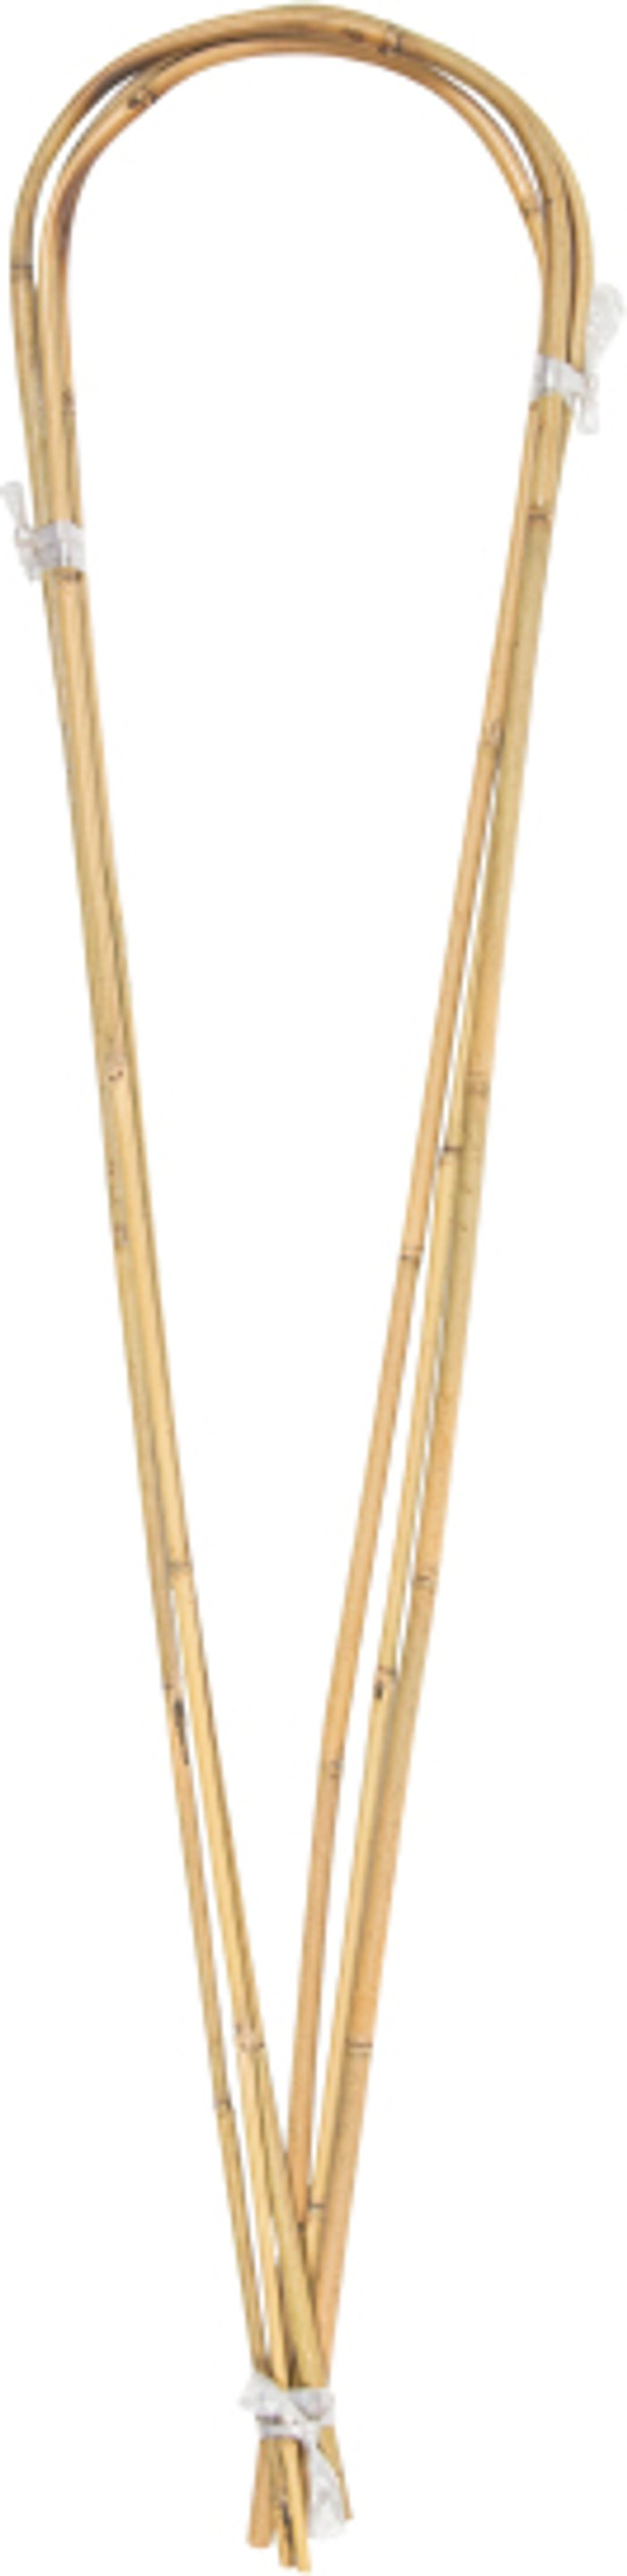 The Range U-Shape Trellis Curved Bamboo - 90cm